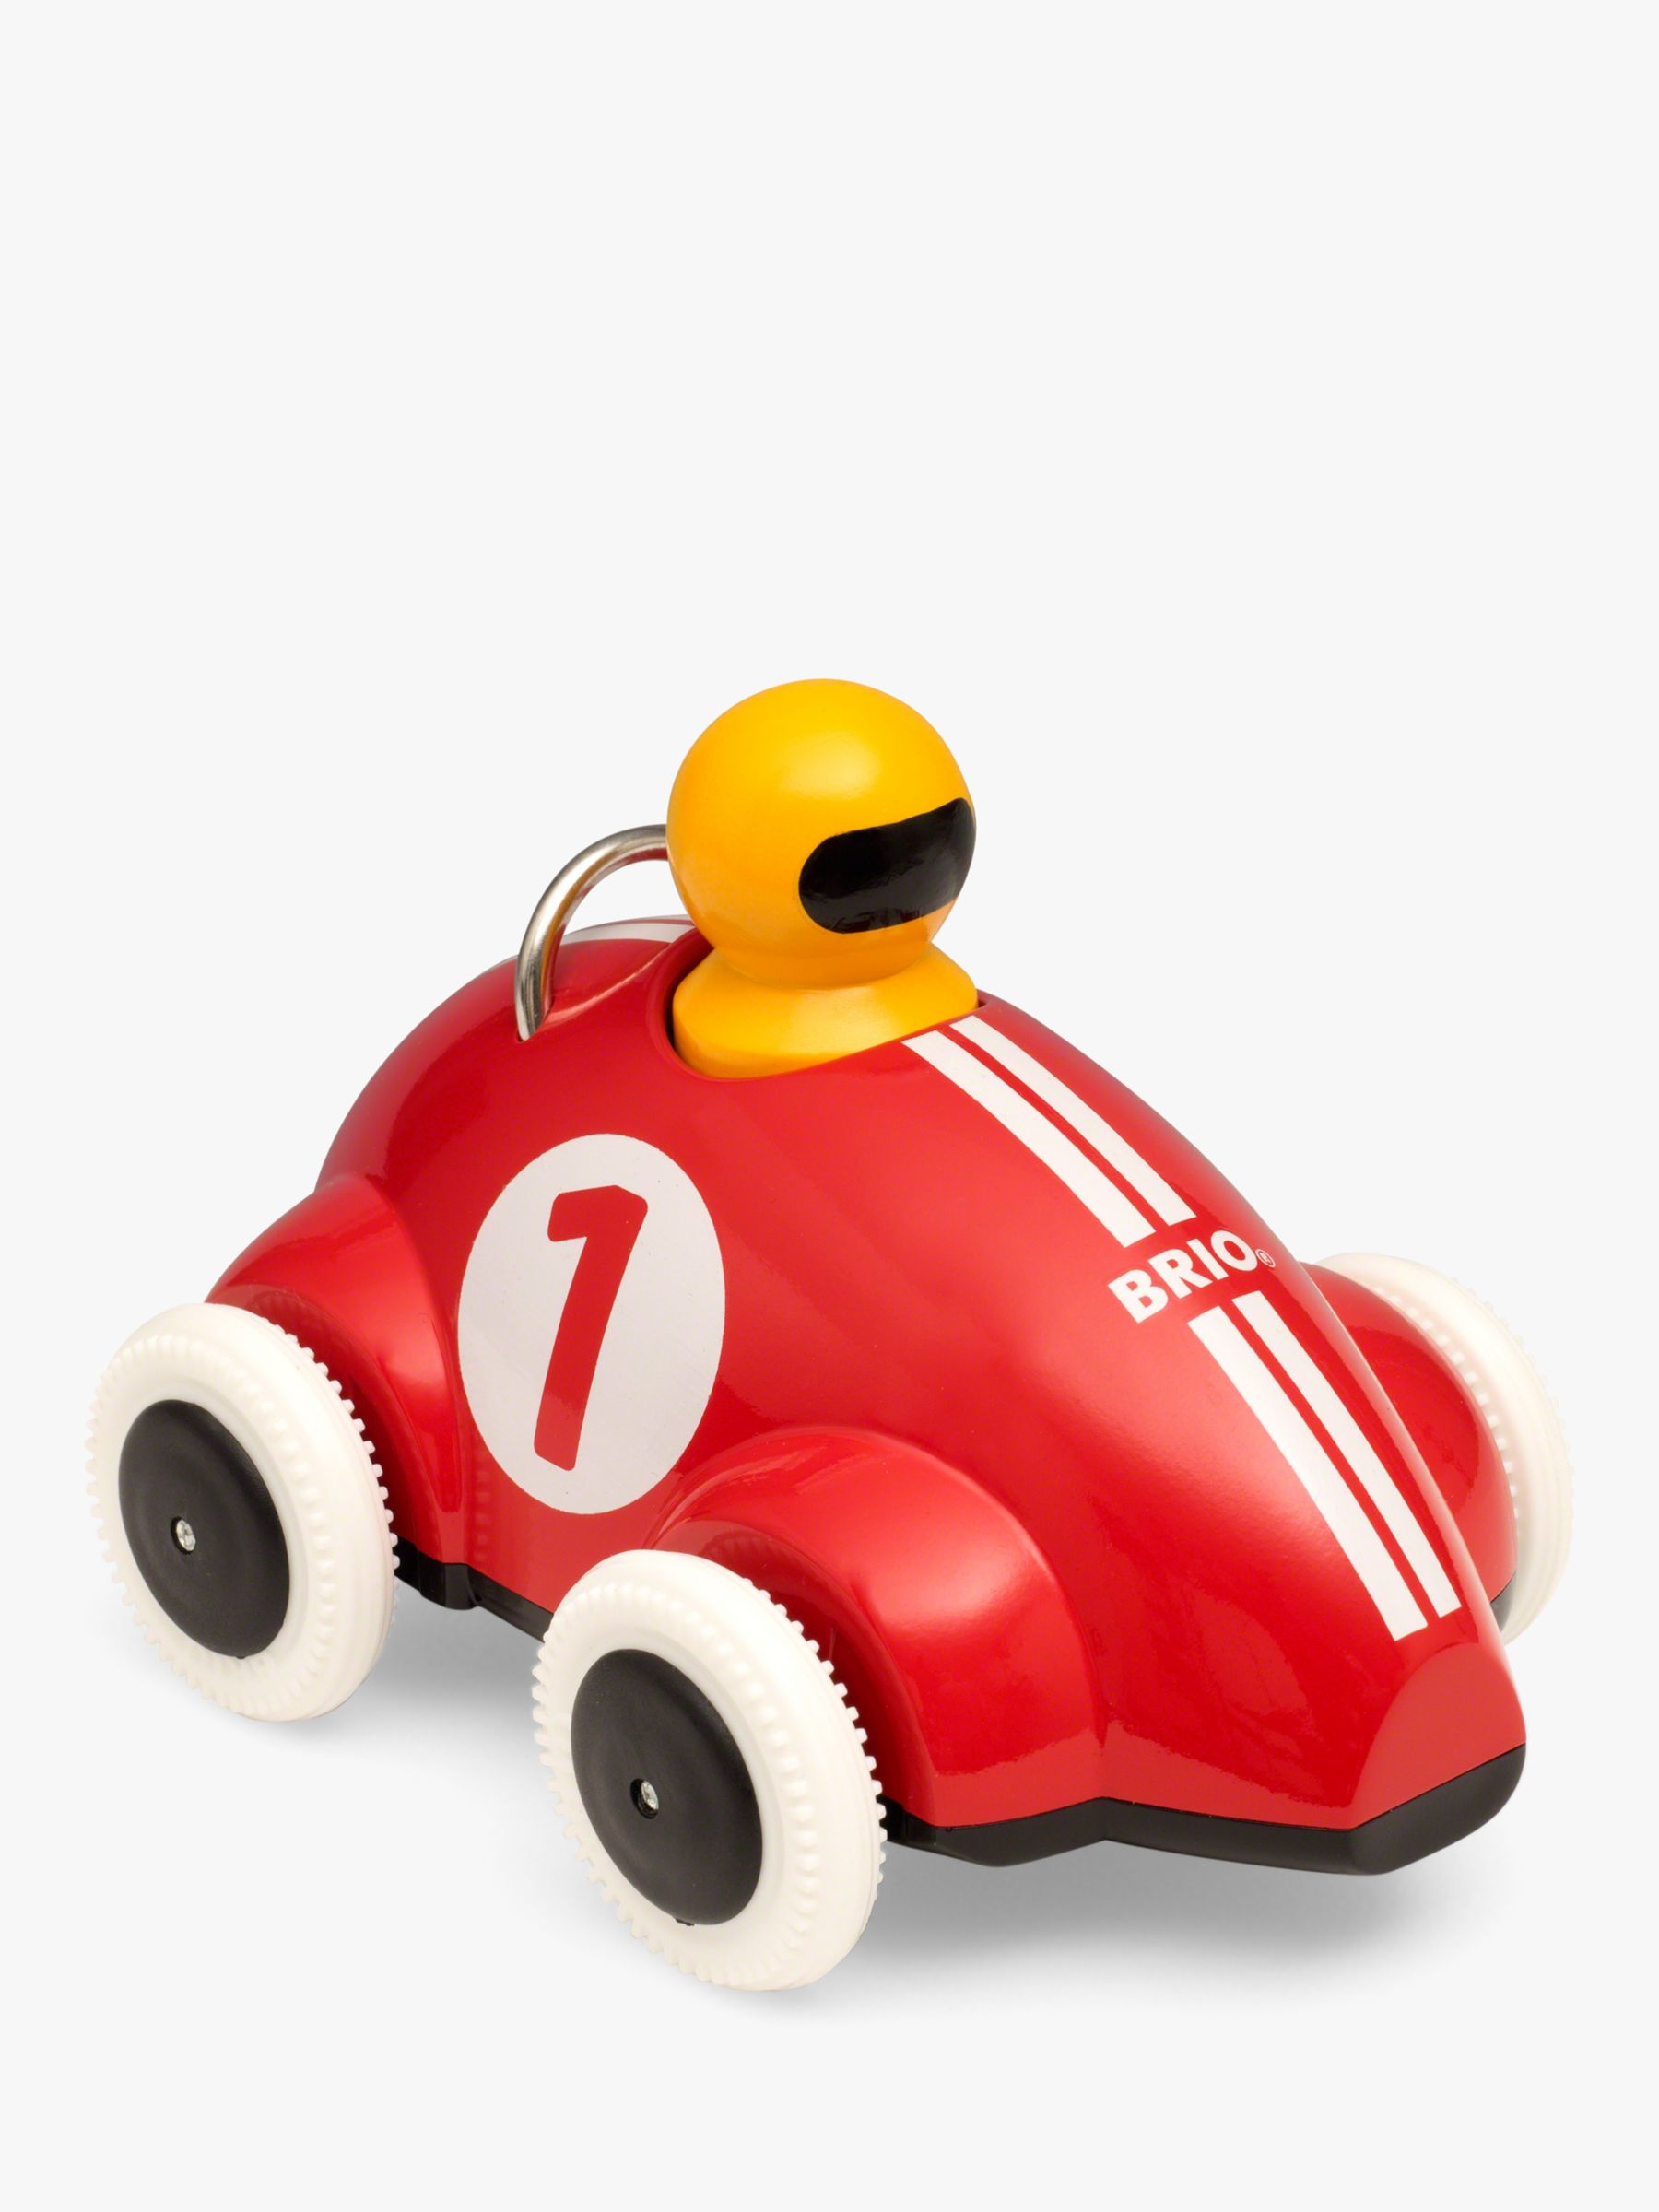 BRIO BRIO Push & GO Racer